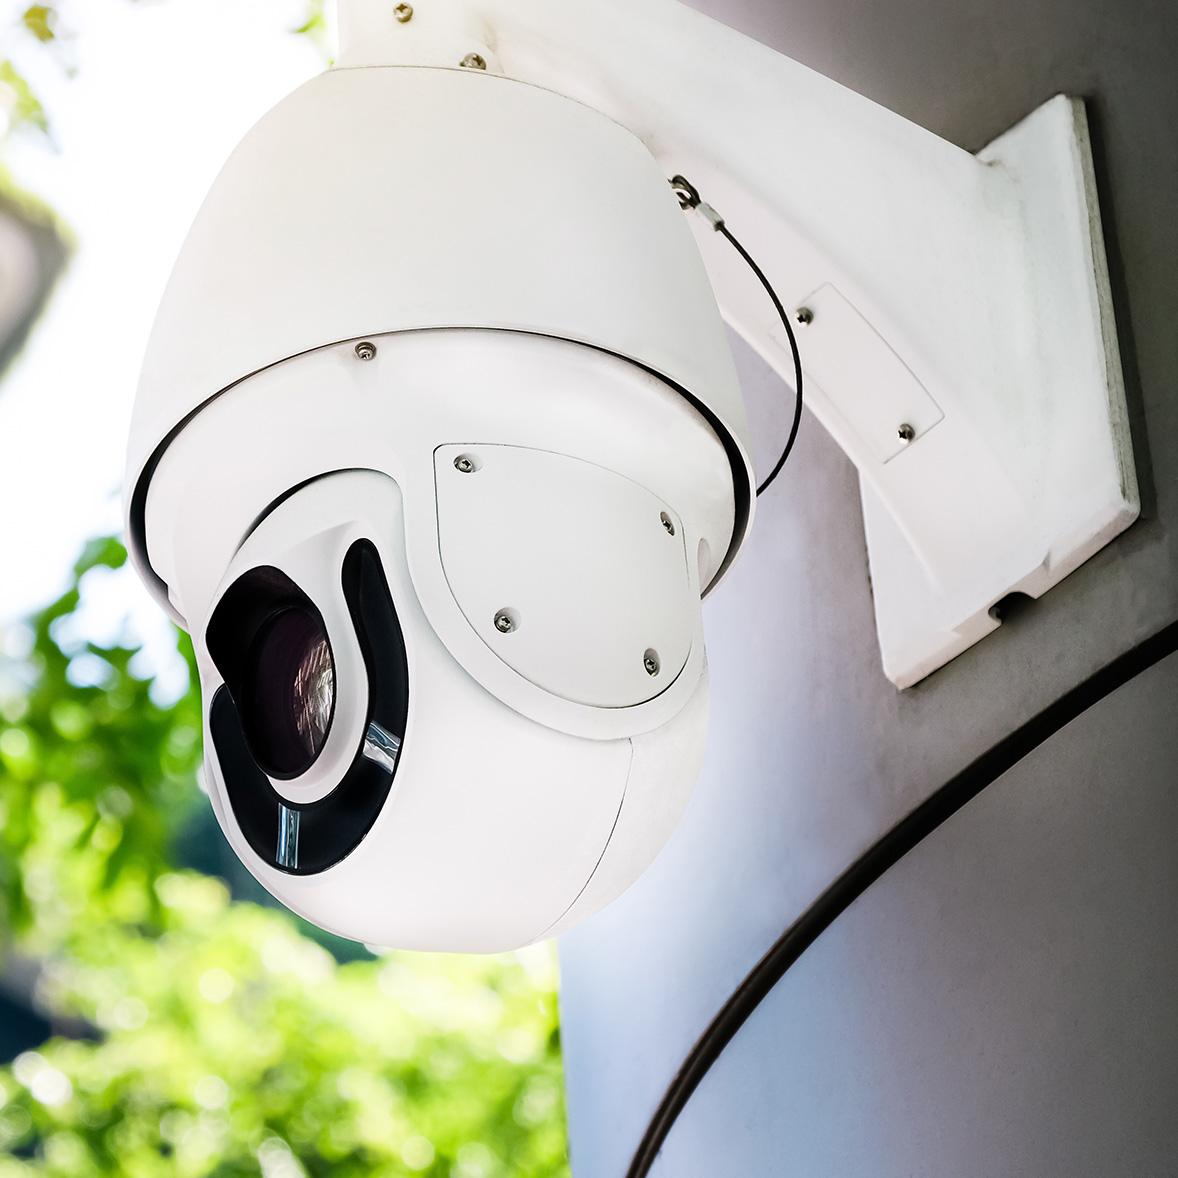 cctv monitoring system